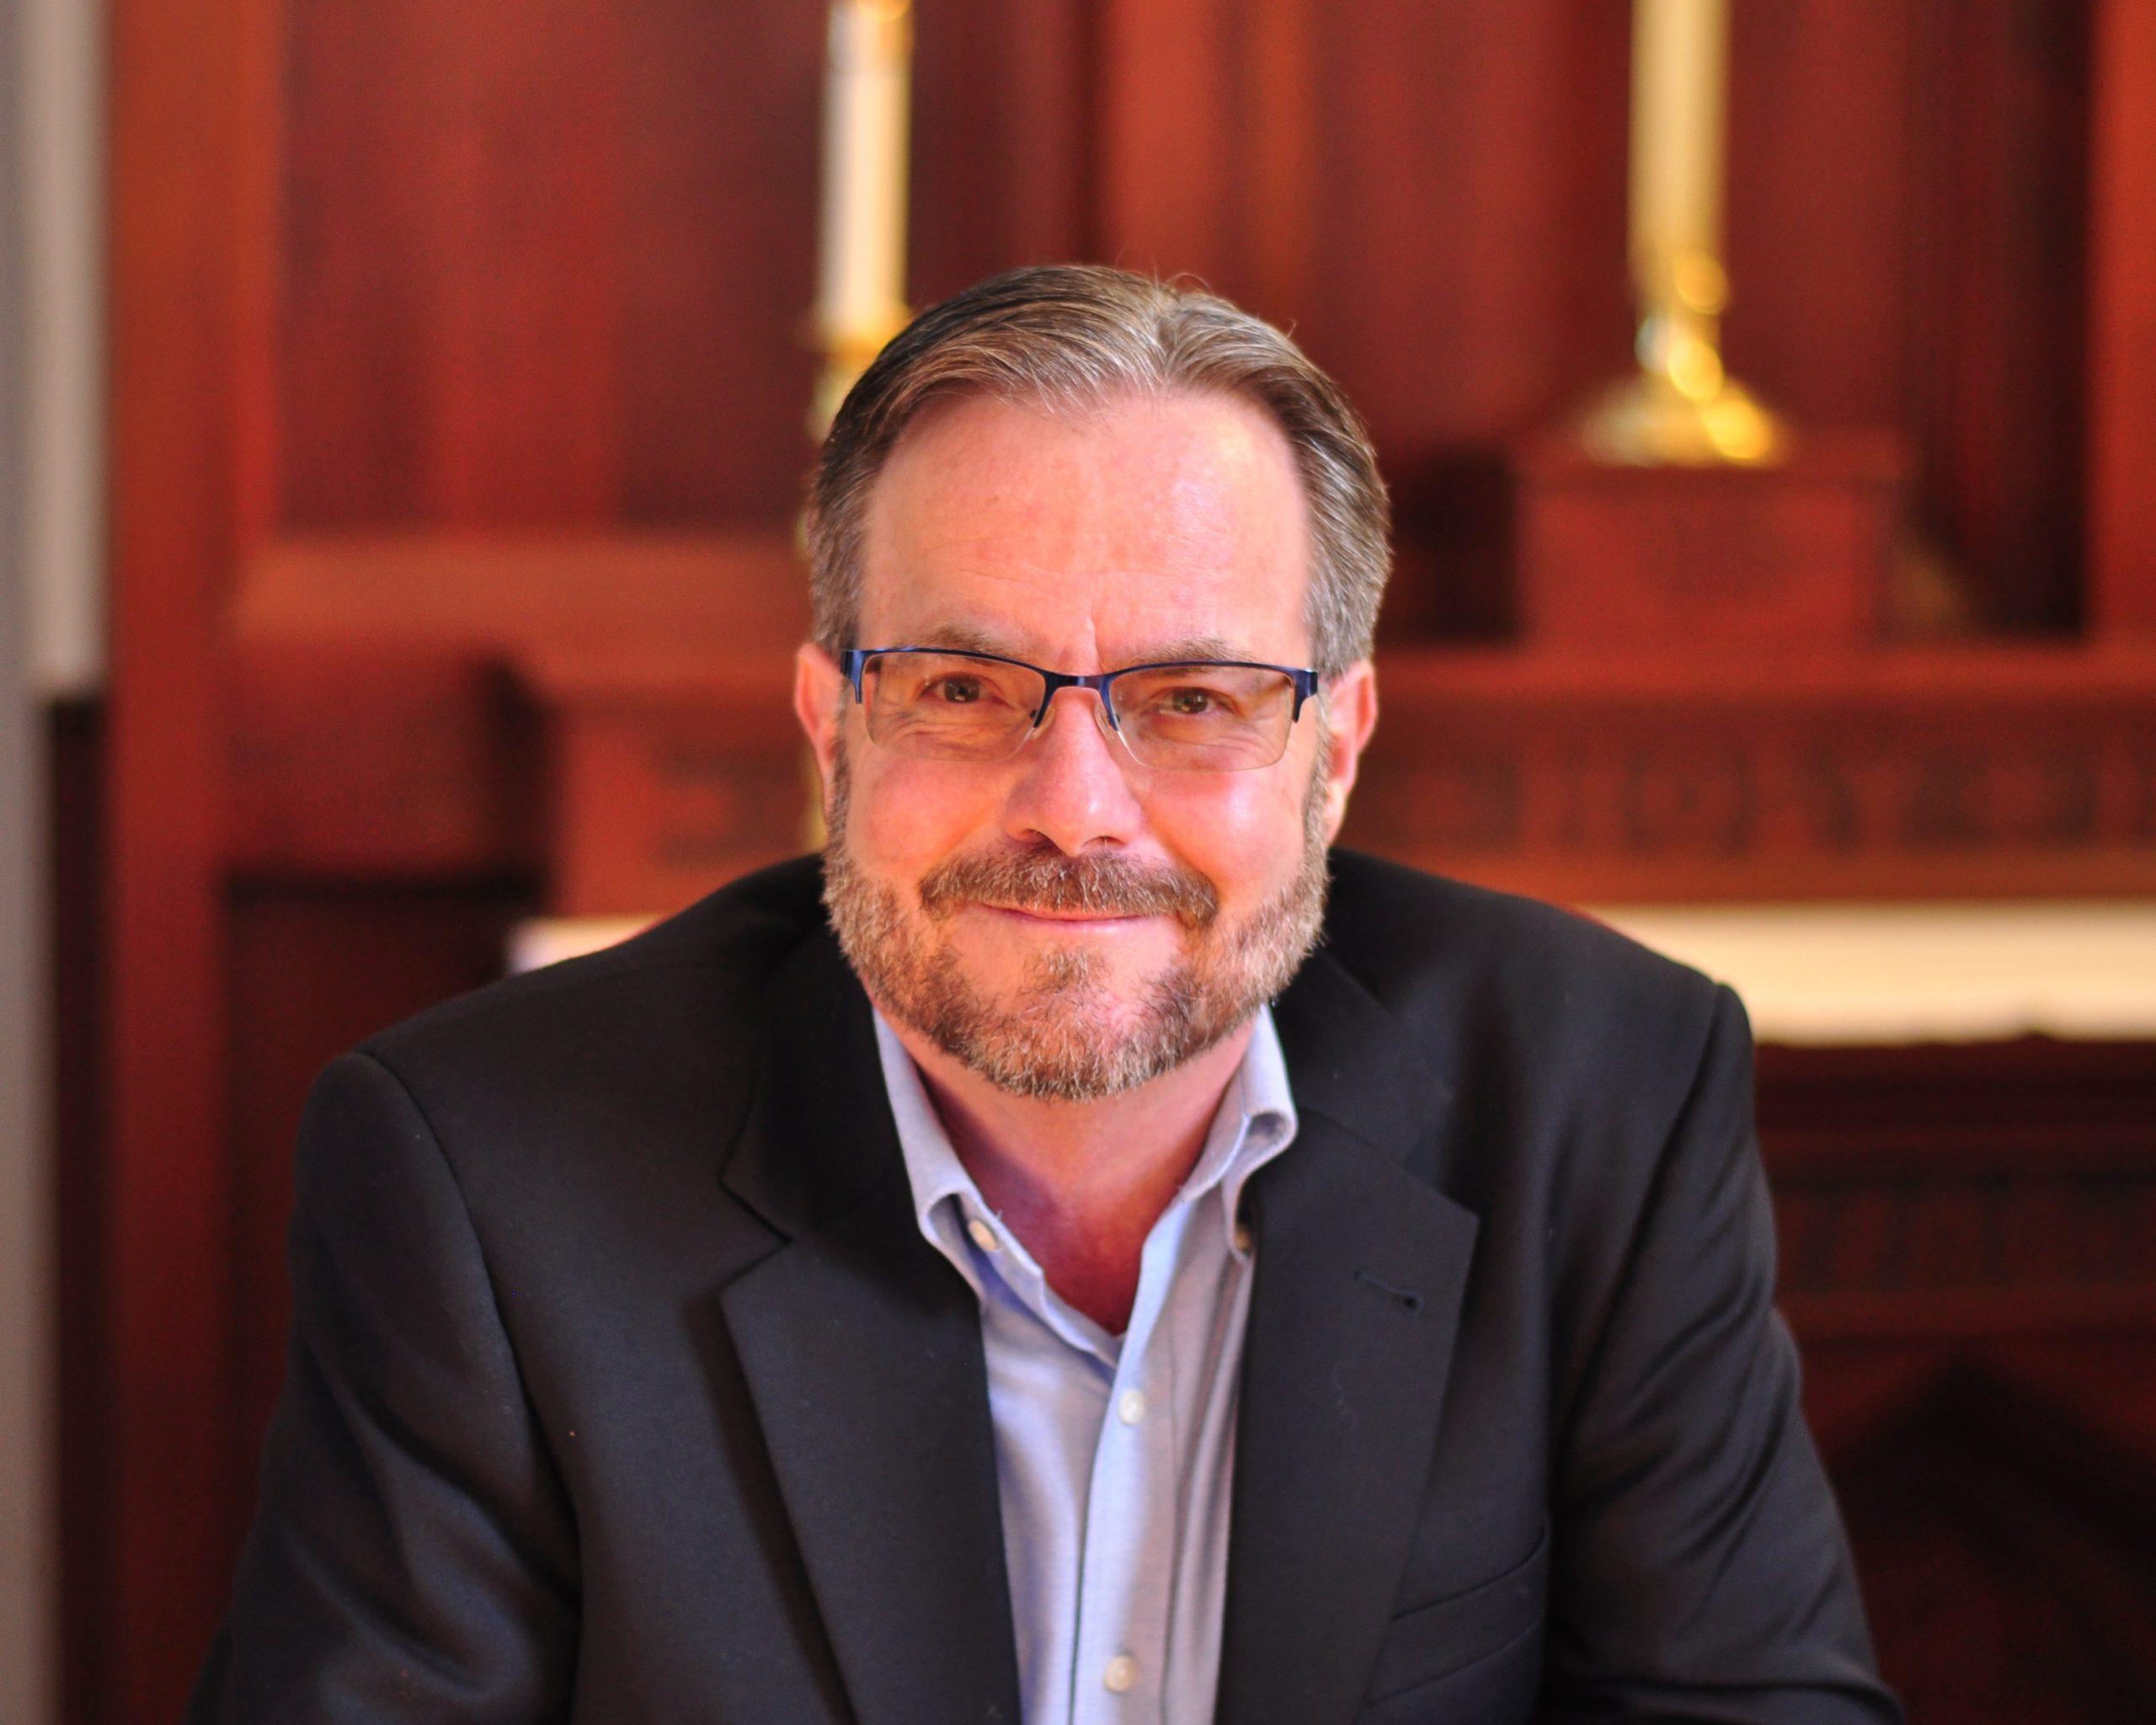 Peter Rothermel